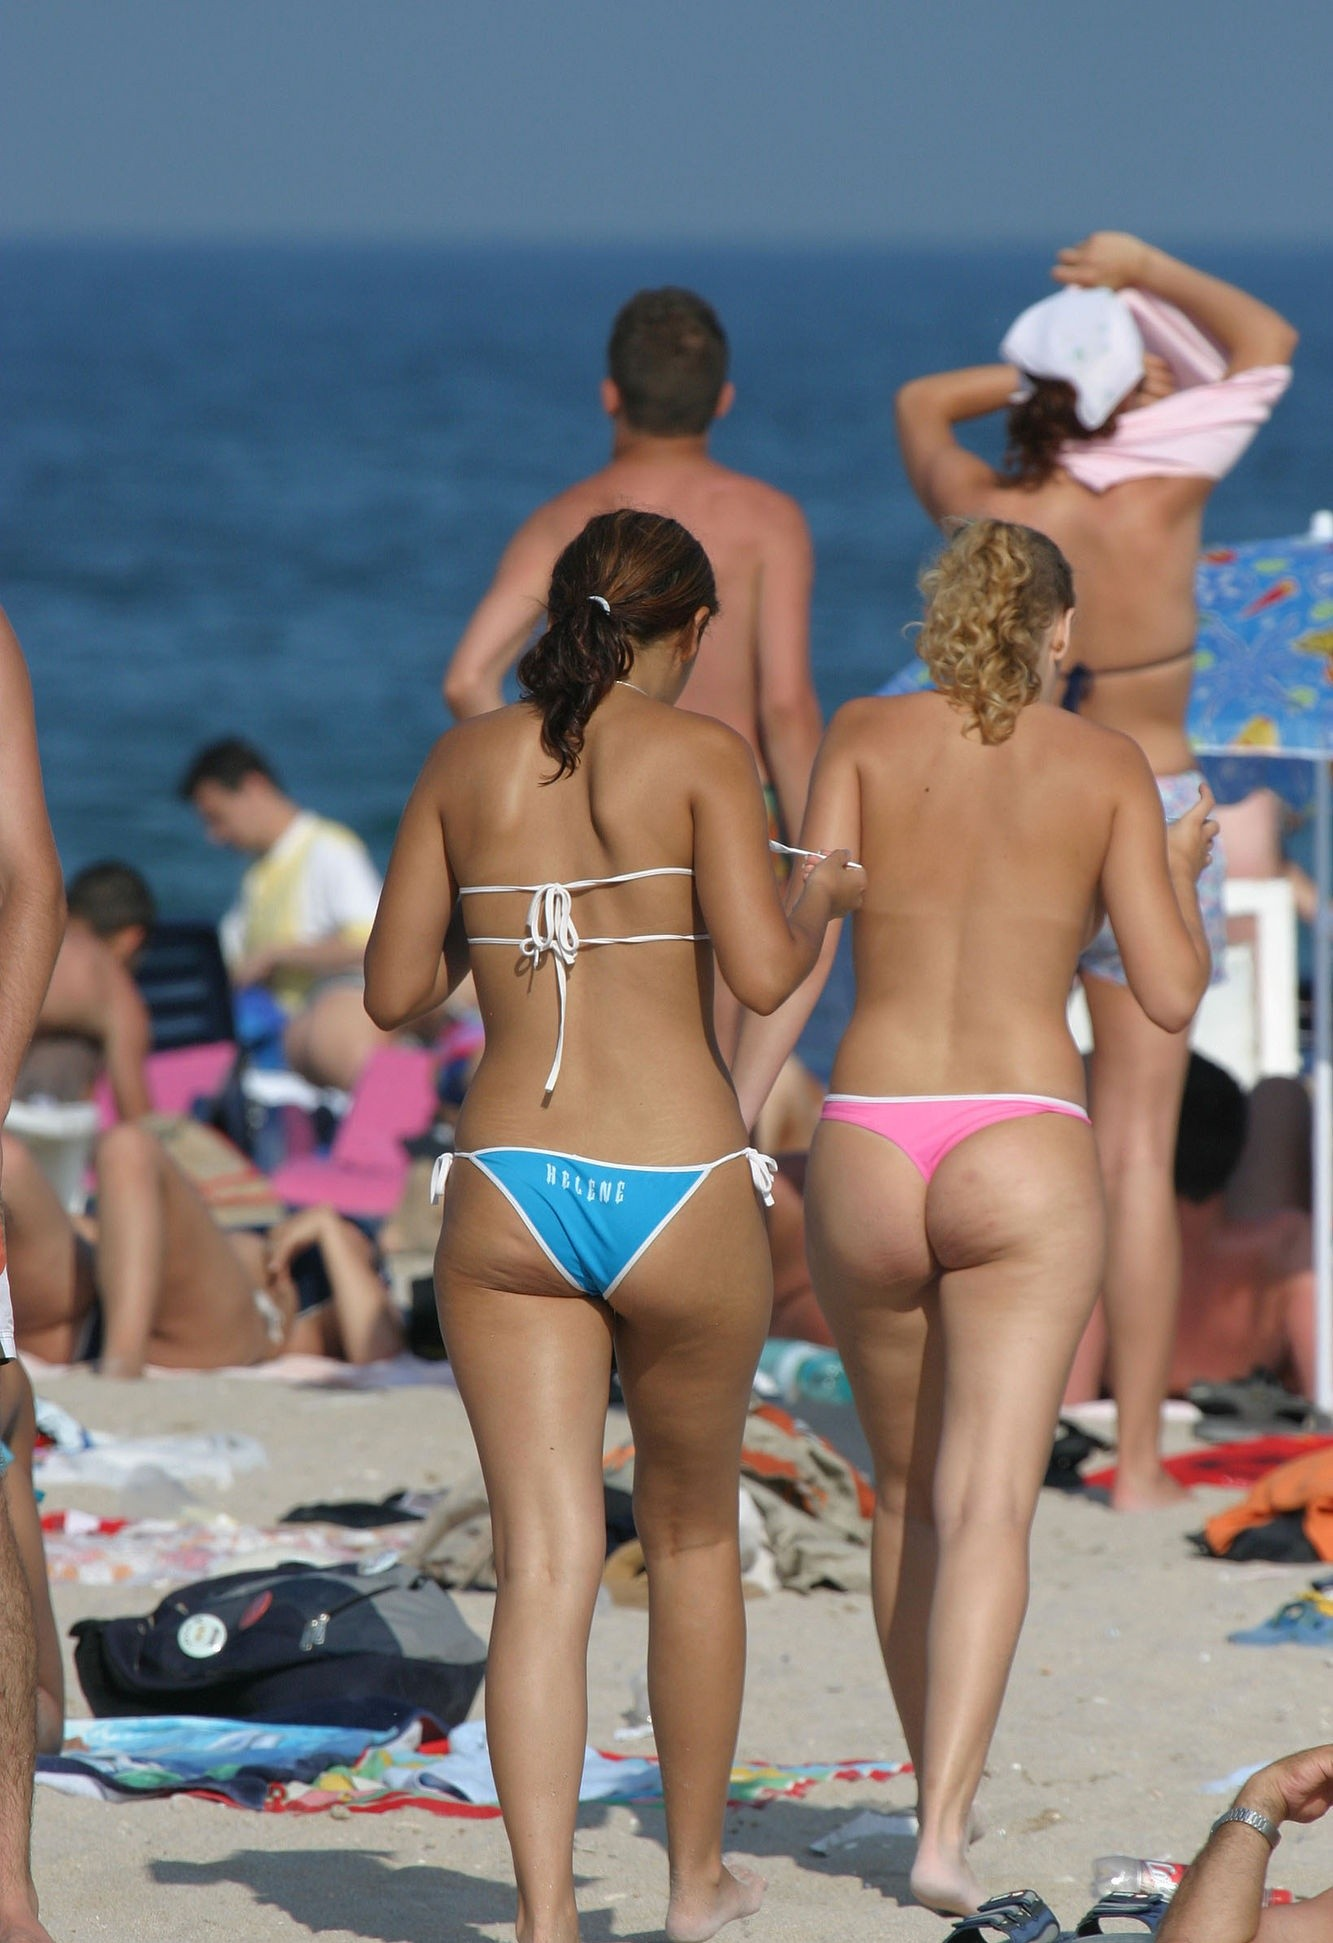 naturist-beaches-hot-couples-positions-amateur-big-girls-small-bikini